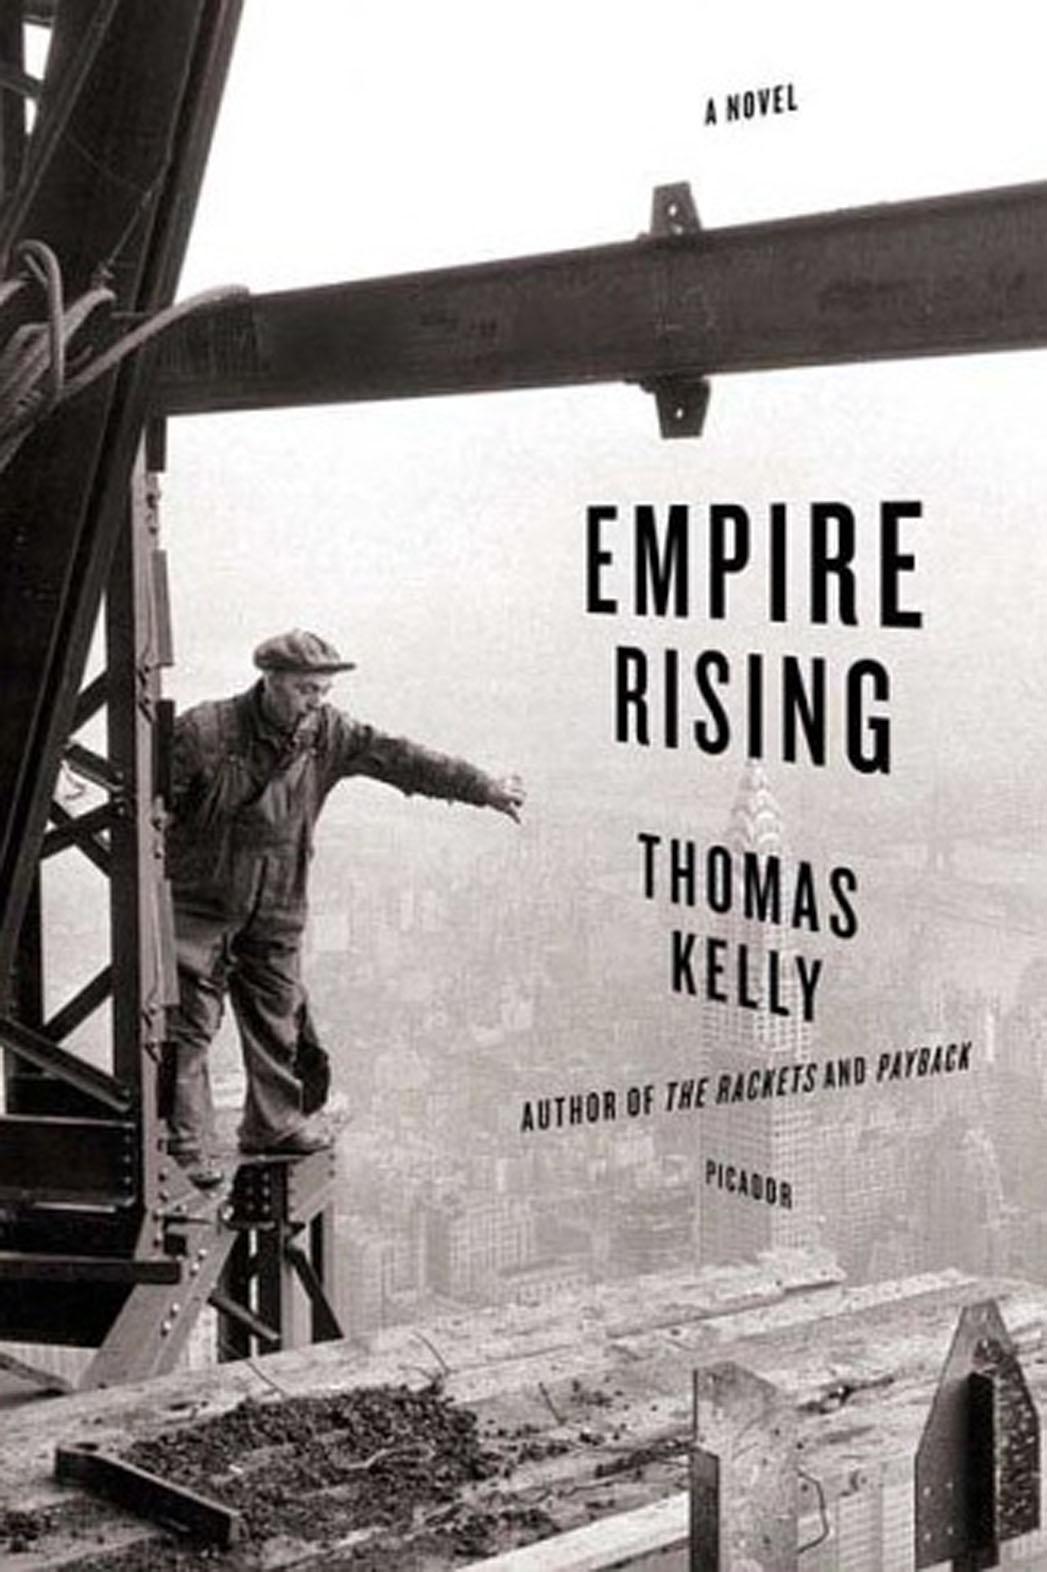 Empire Rising Thomas Kelly Book Cover - P 2013